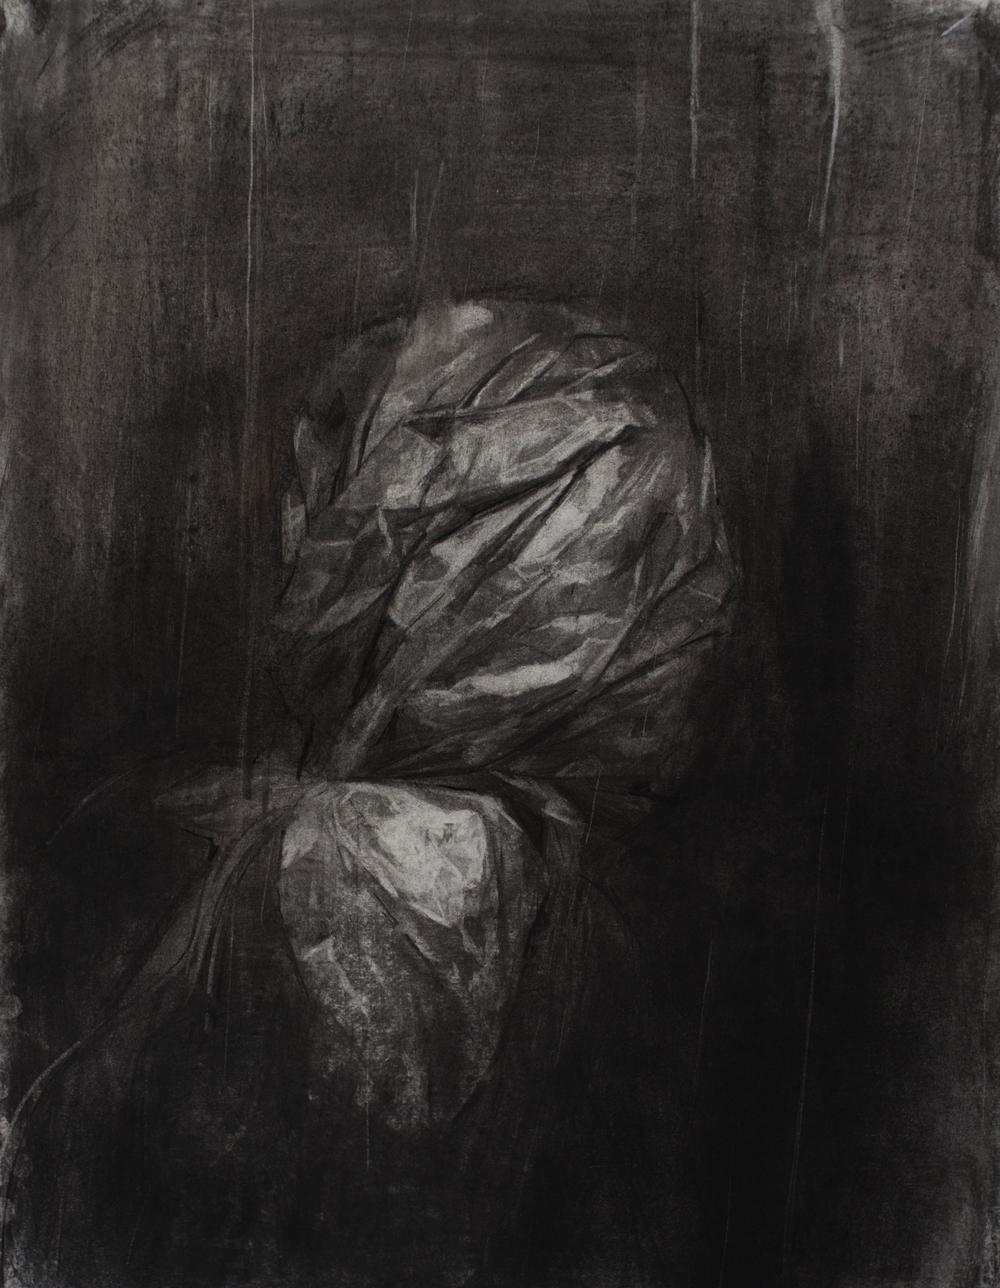 Bagged, 18x24 inch, charcoal, 2016